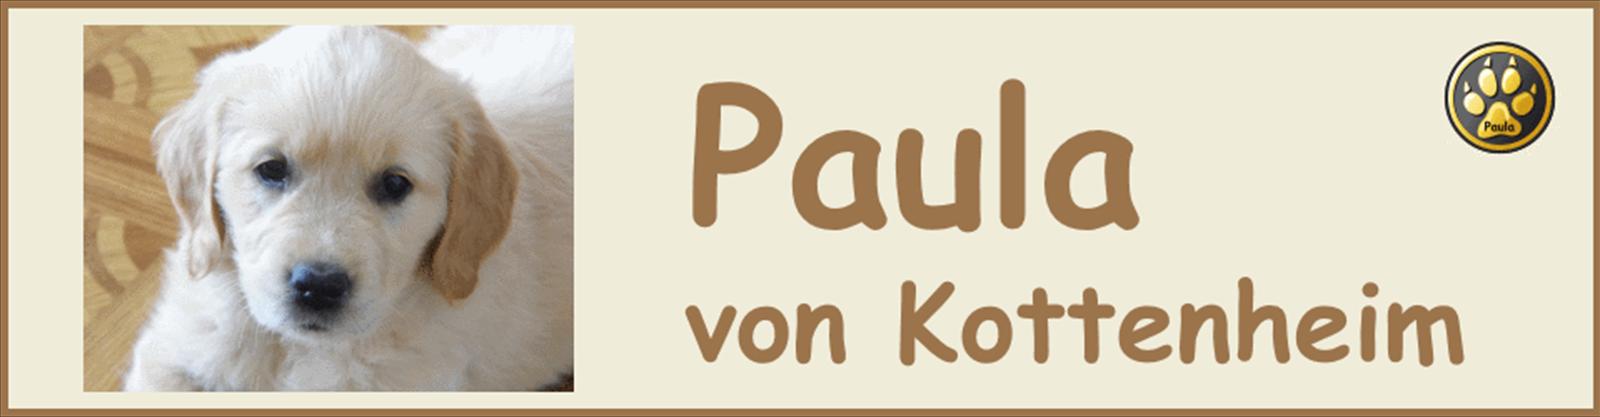 Paula-Banner-01